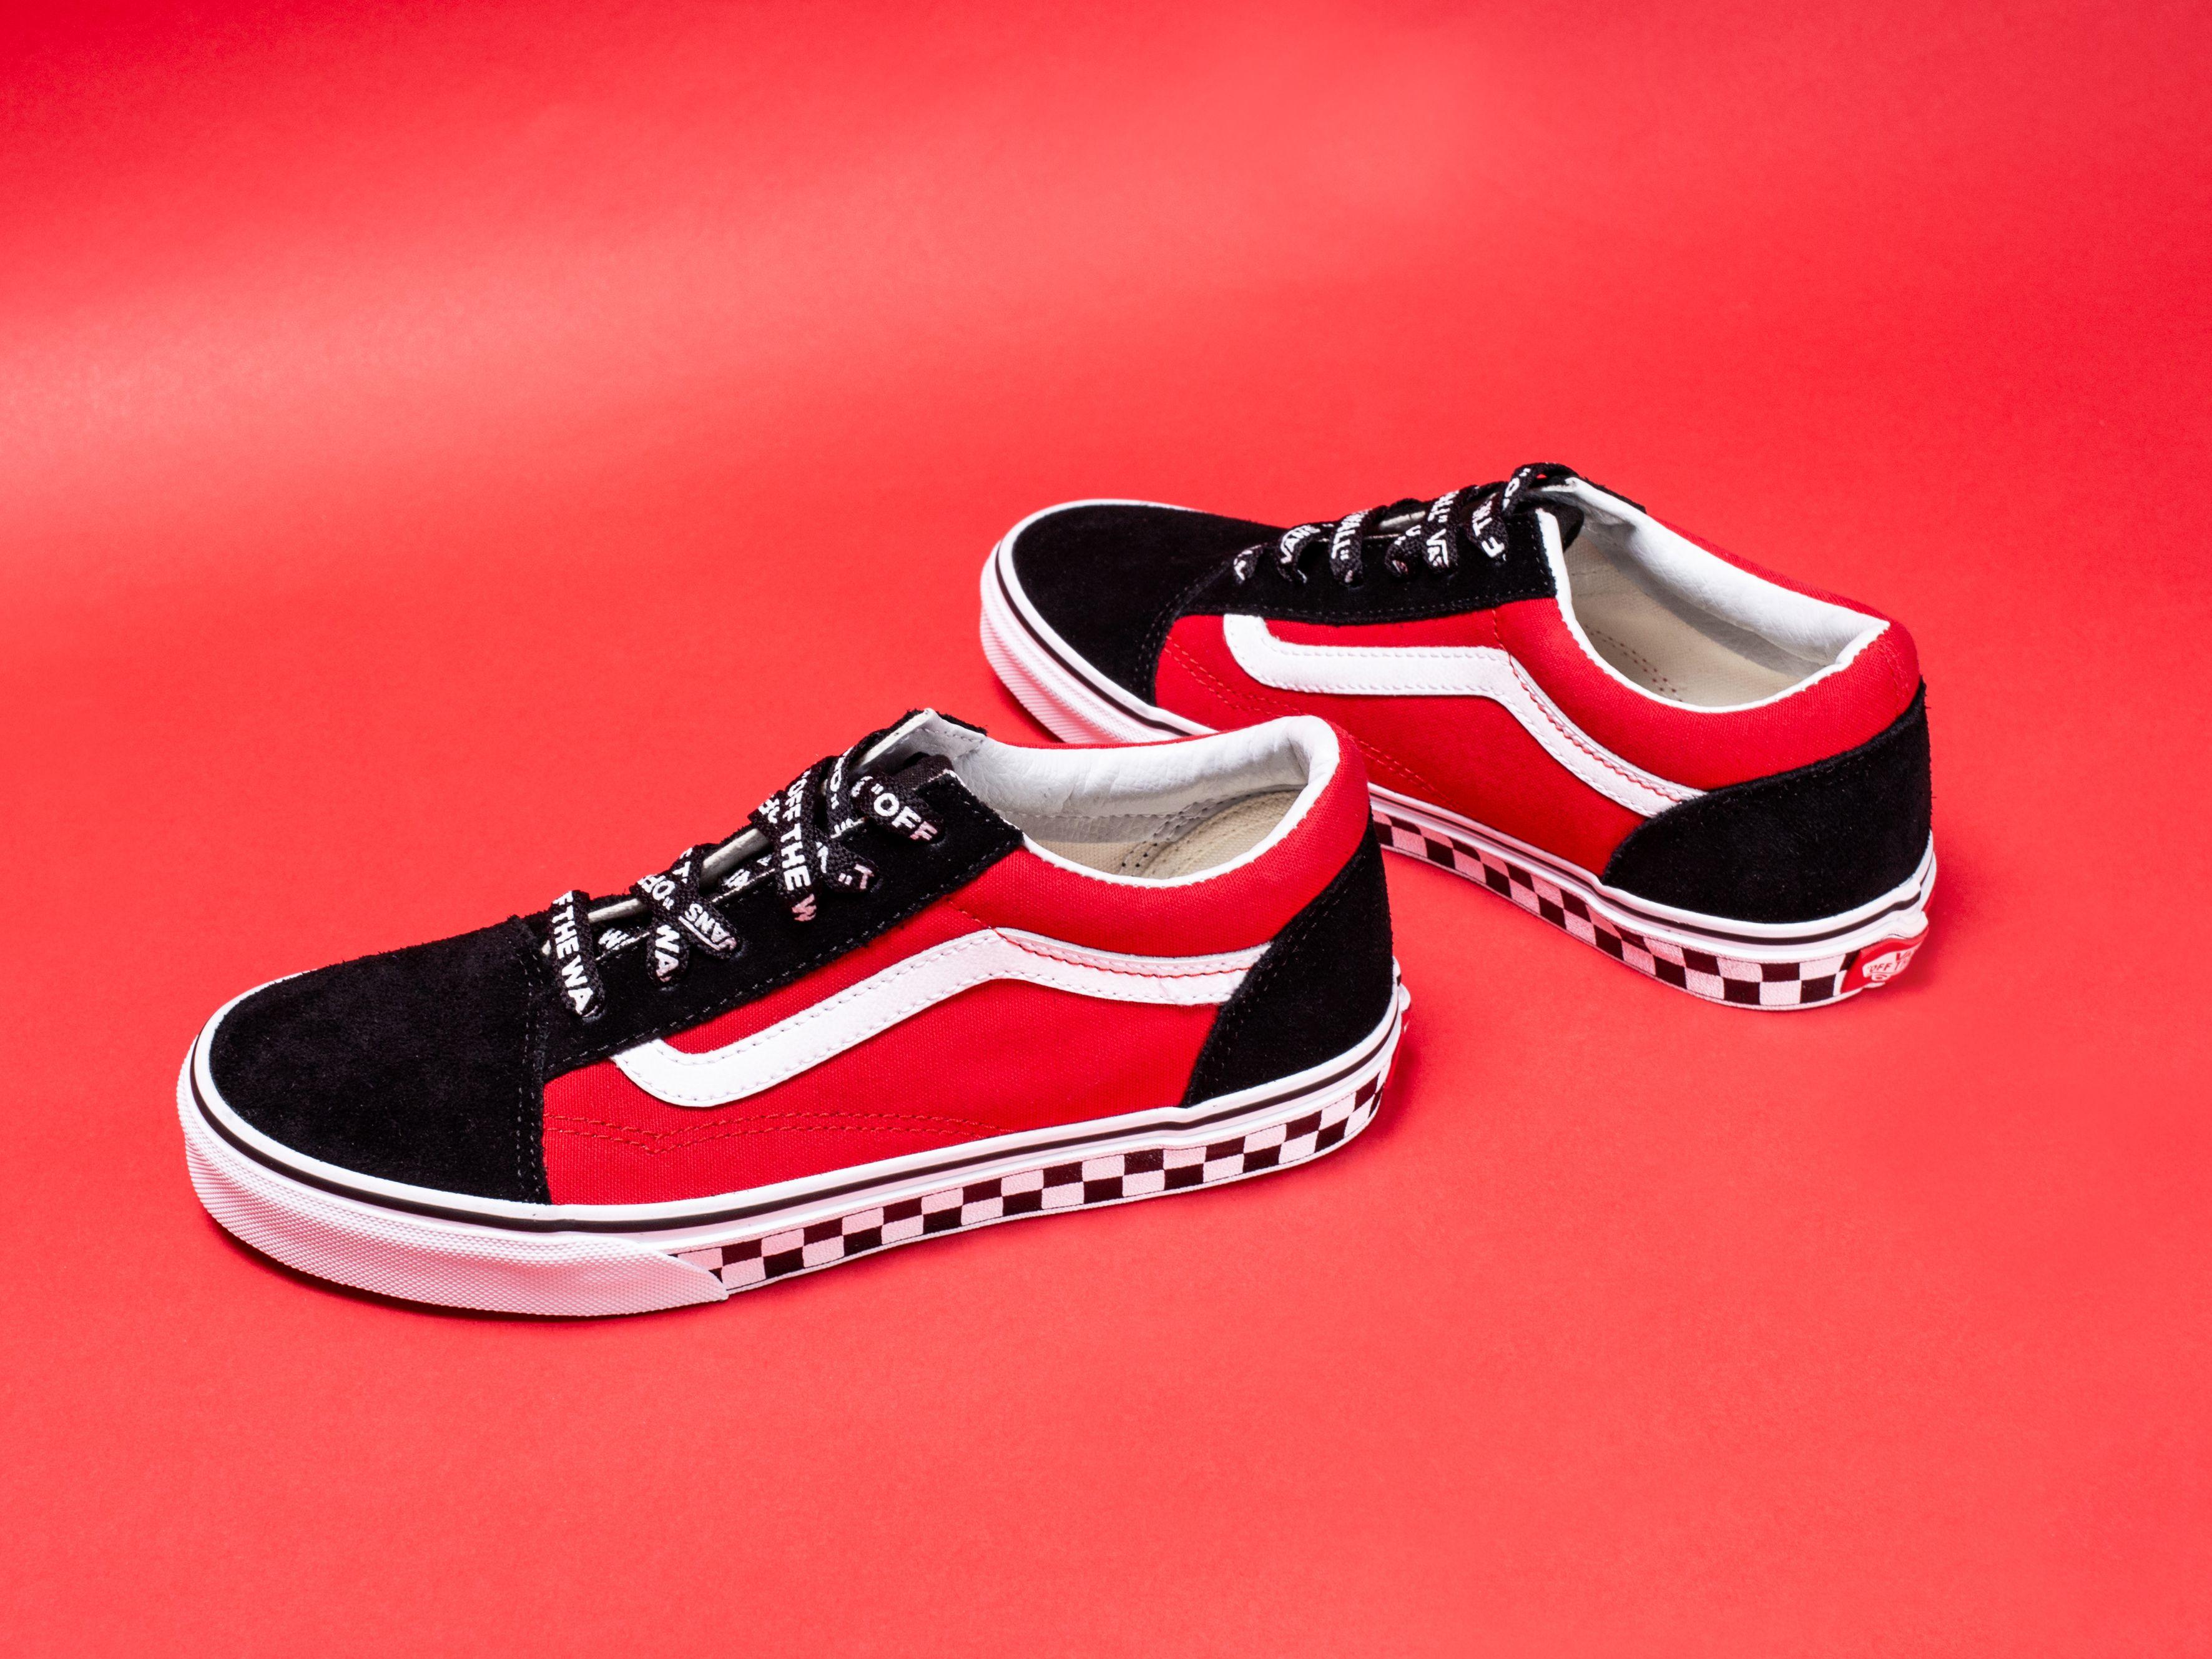 La Vans #Oldskool revisitée ! #basics #basique #sneakers ...